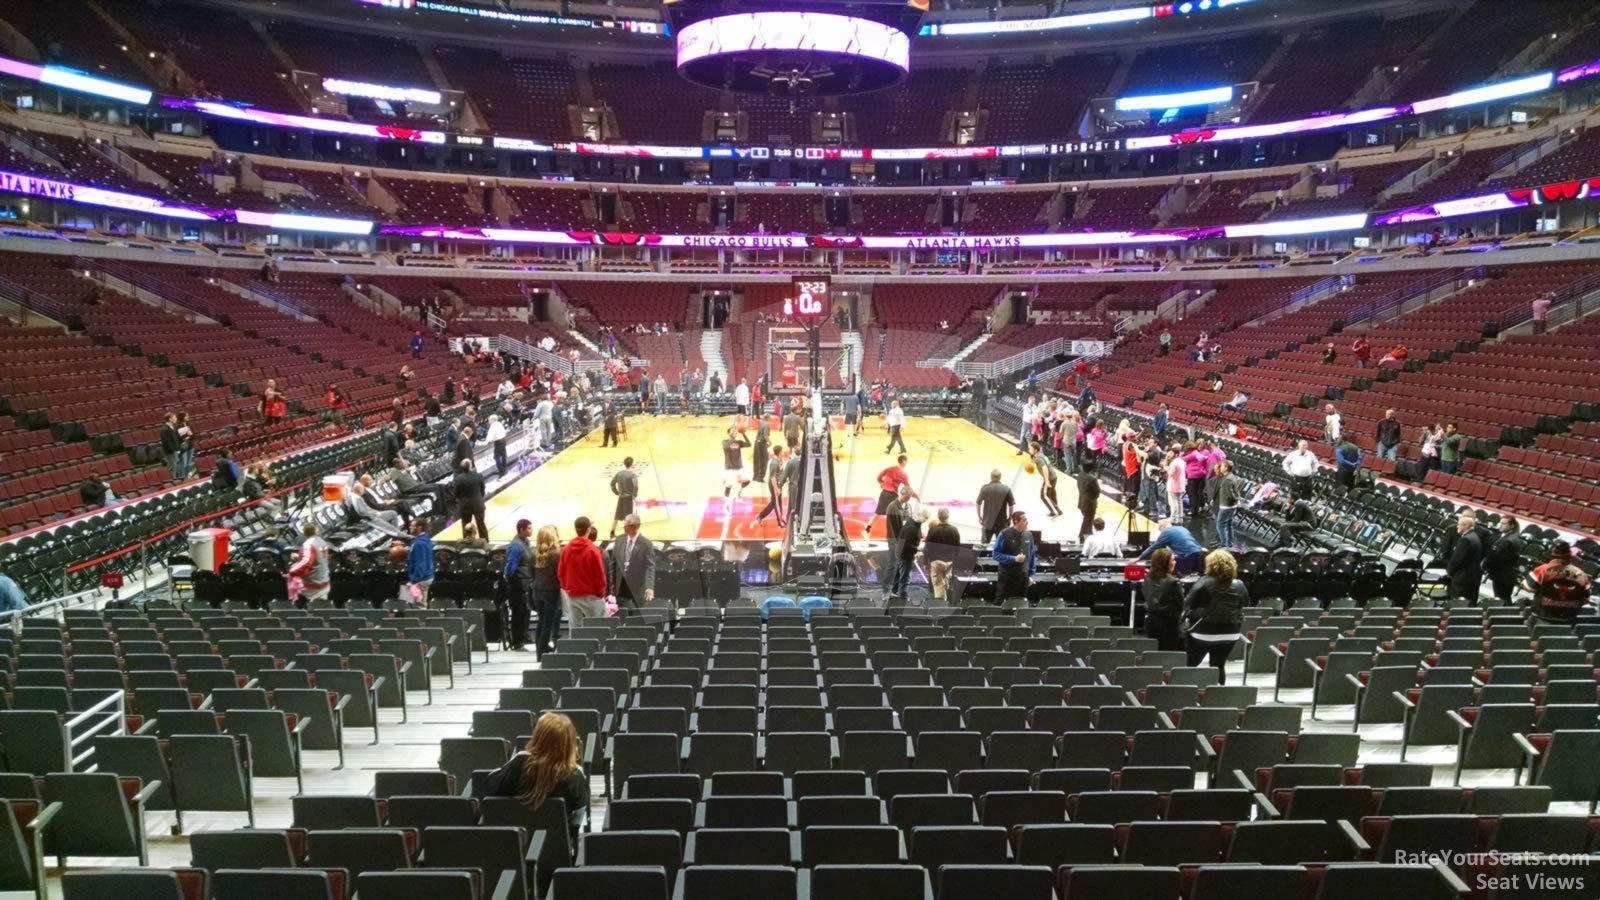 Lower Level Baseline United Center Basketball Seating